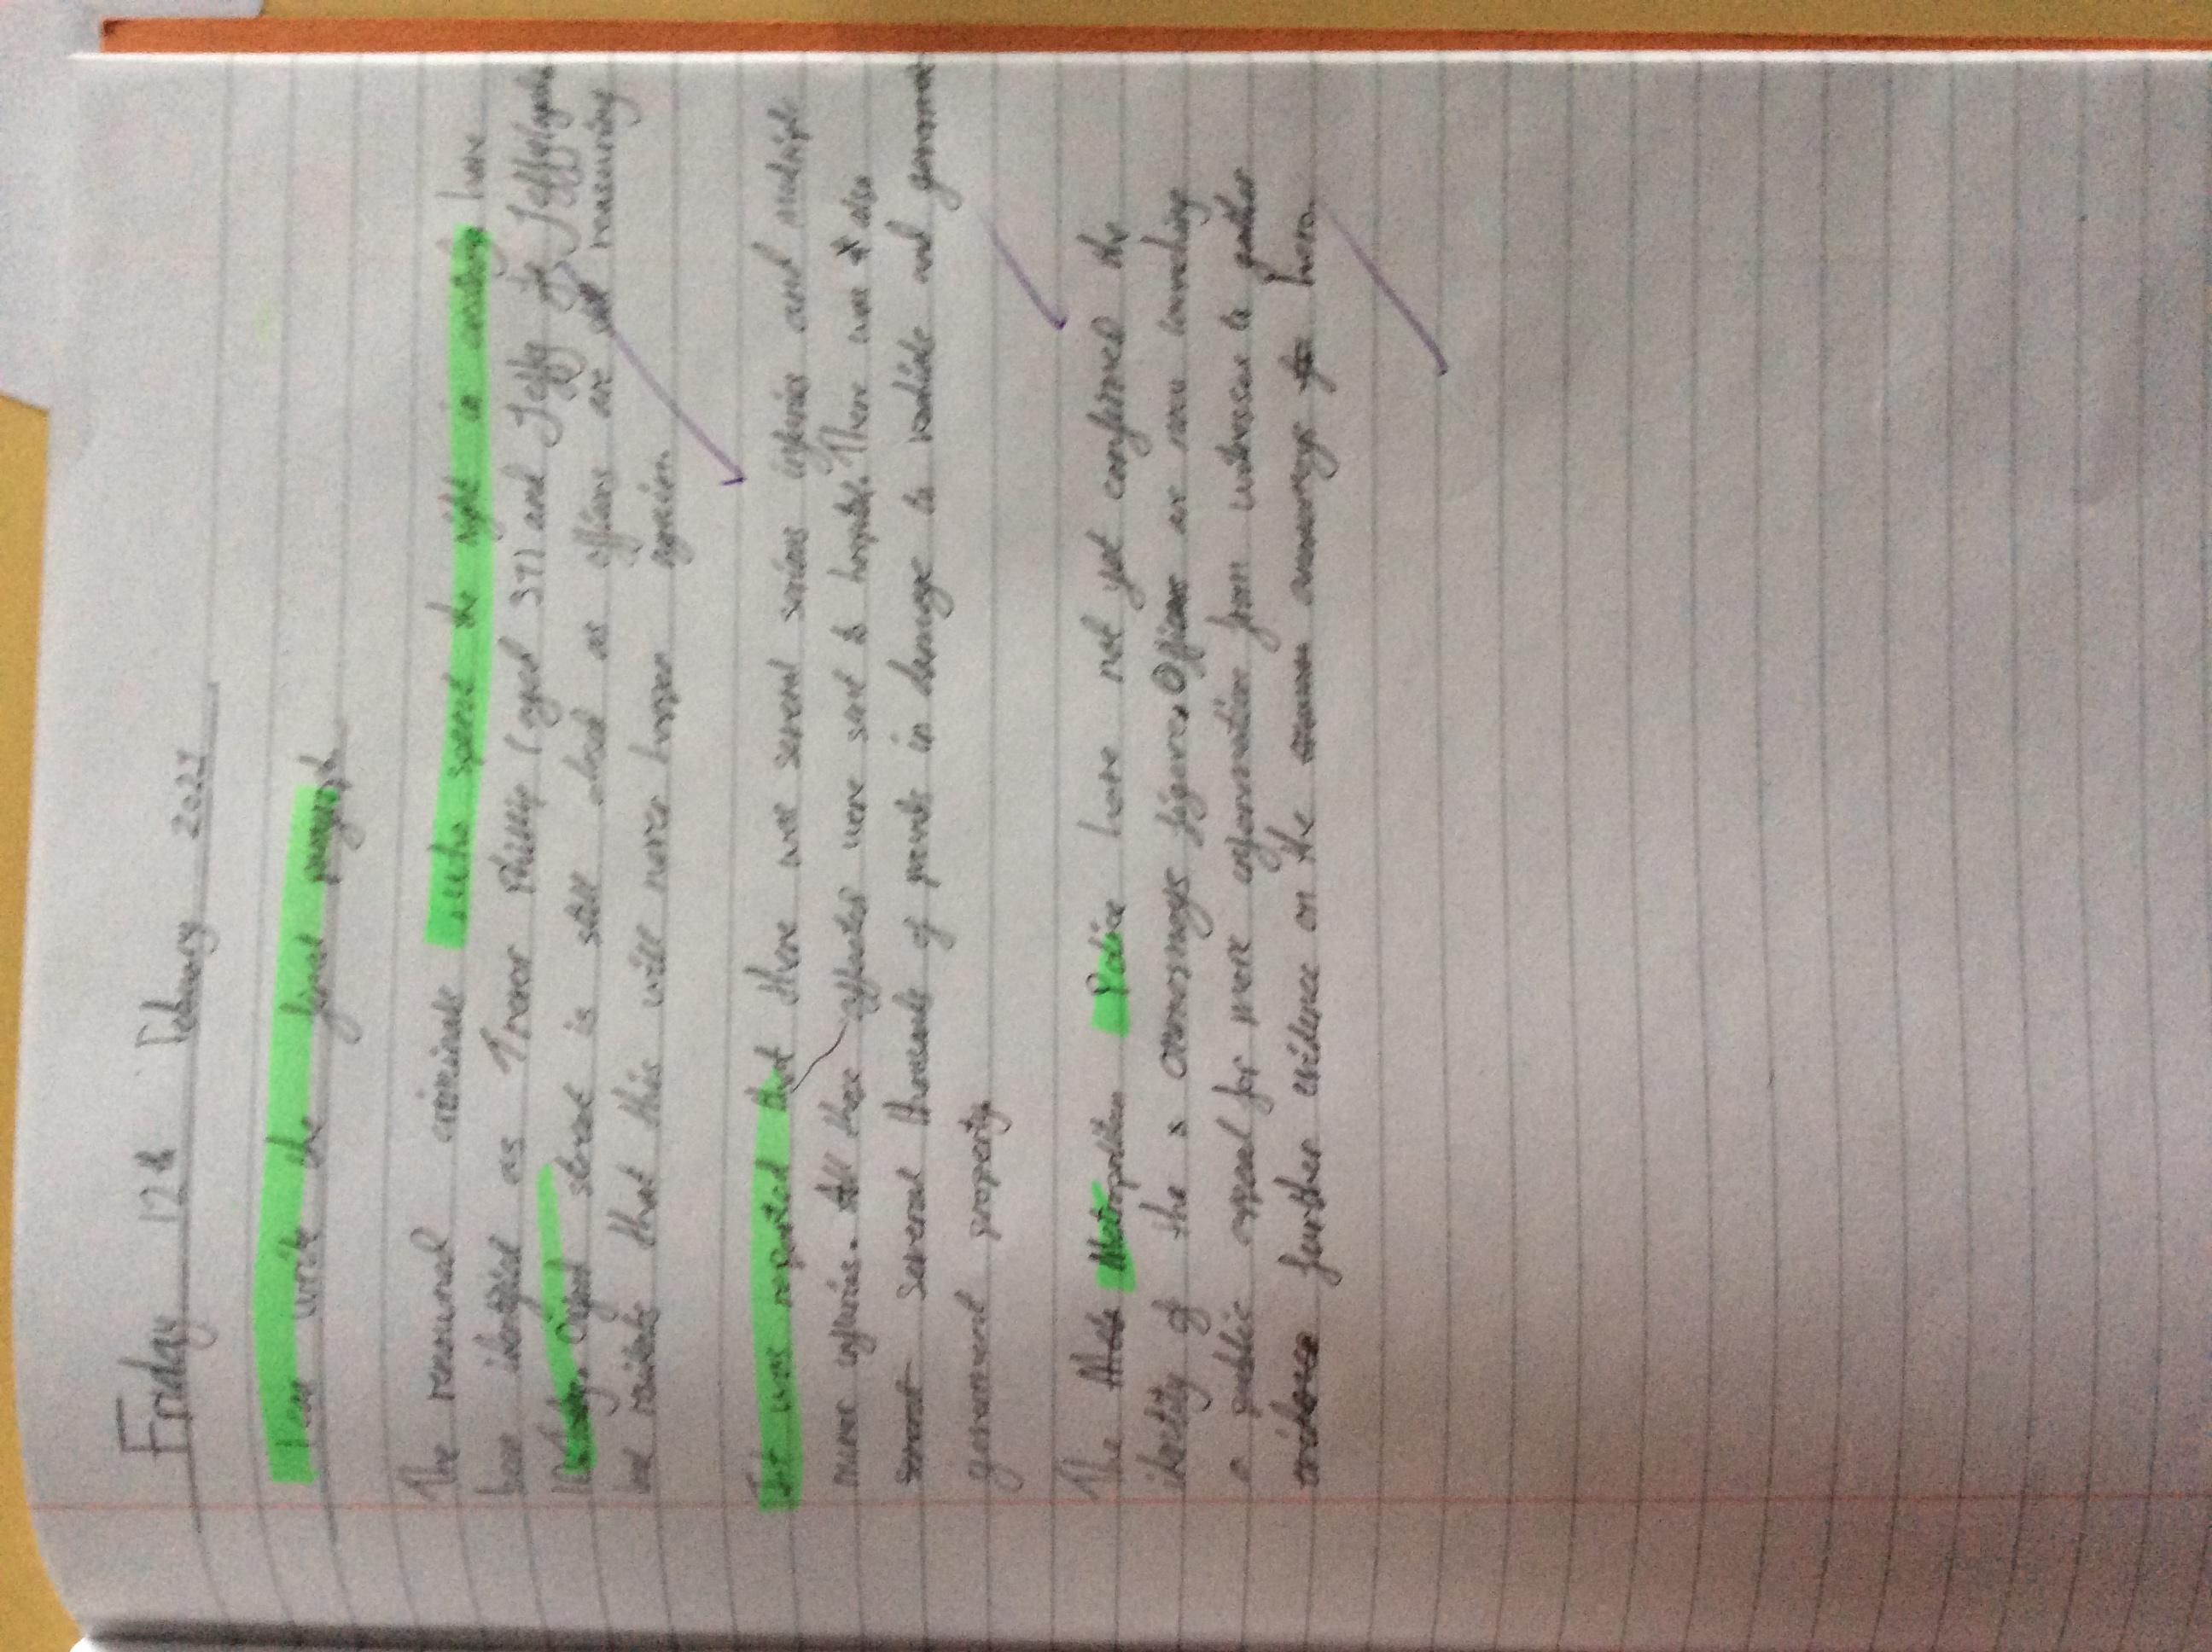 Joseph's wonderful writing!